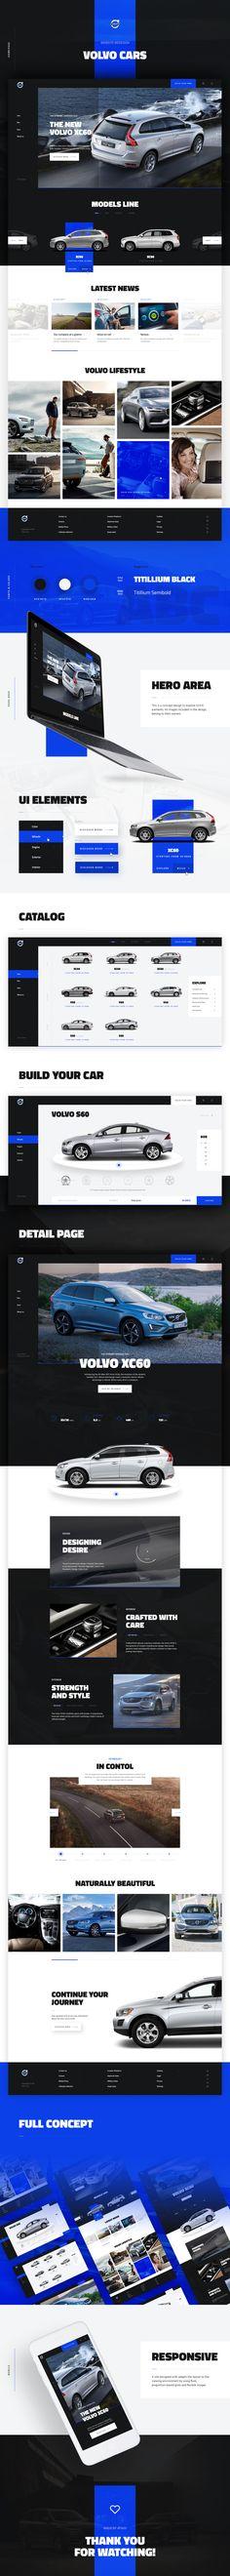 Volvo Concept on Behance